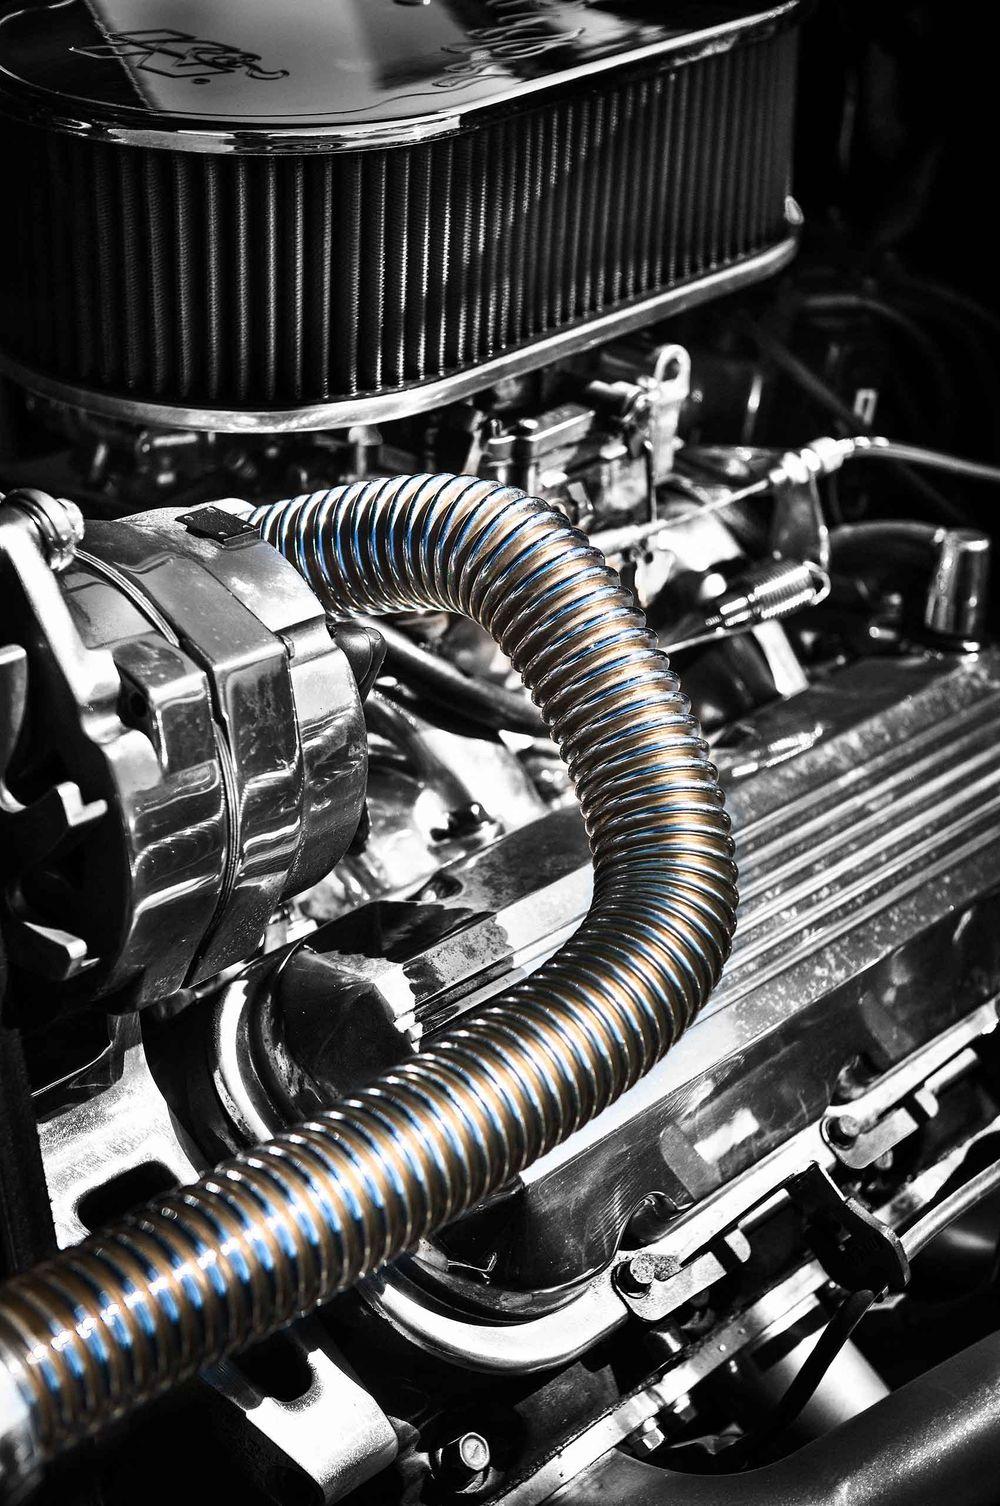 engine-vivalasvegas-rockabillyweekend-lasvegas-by-henrikolundphotography.jpg